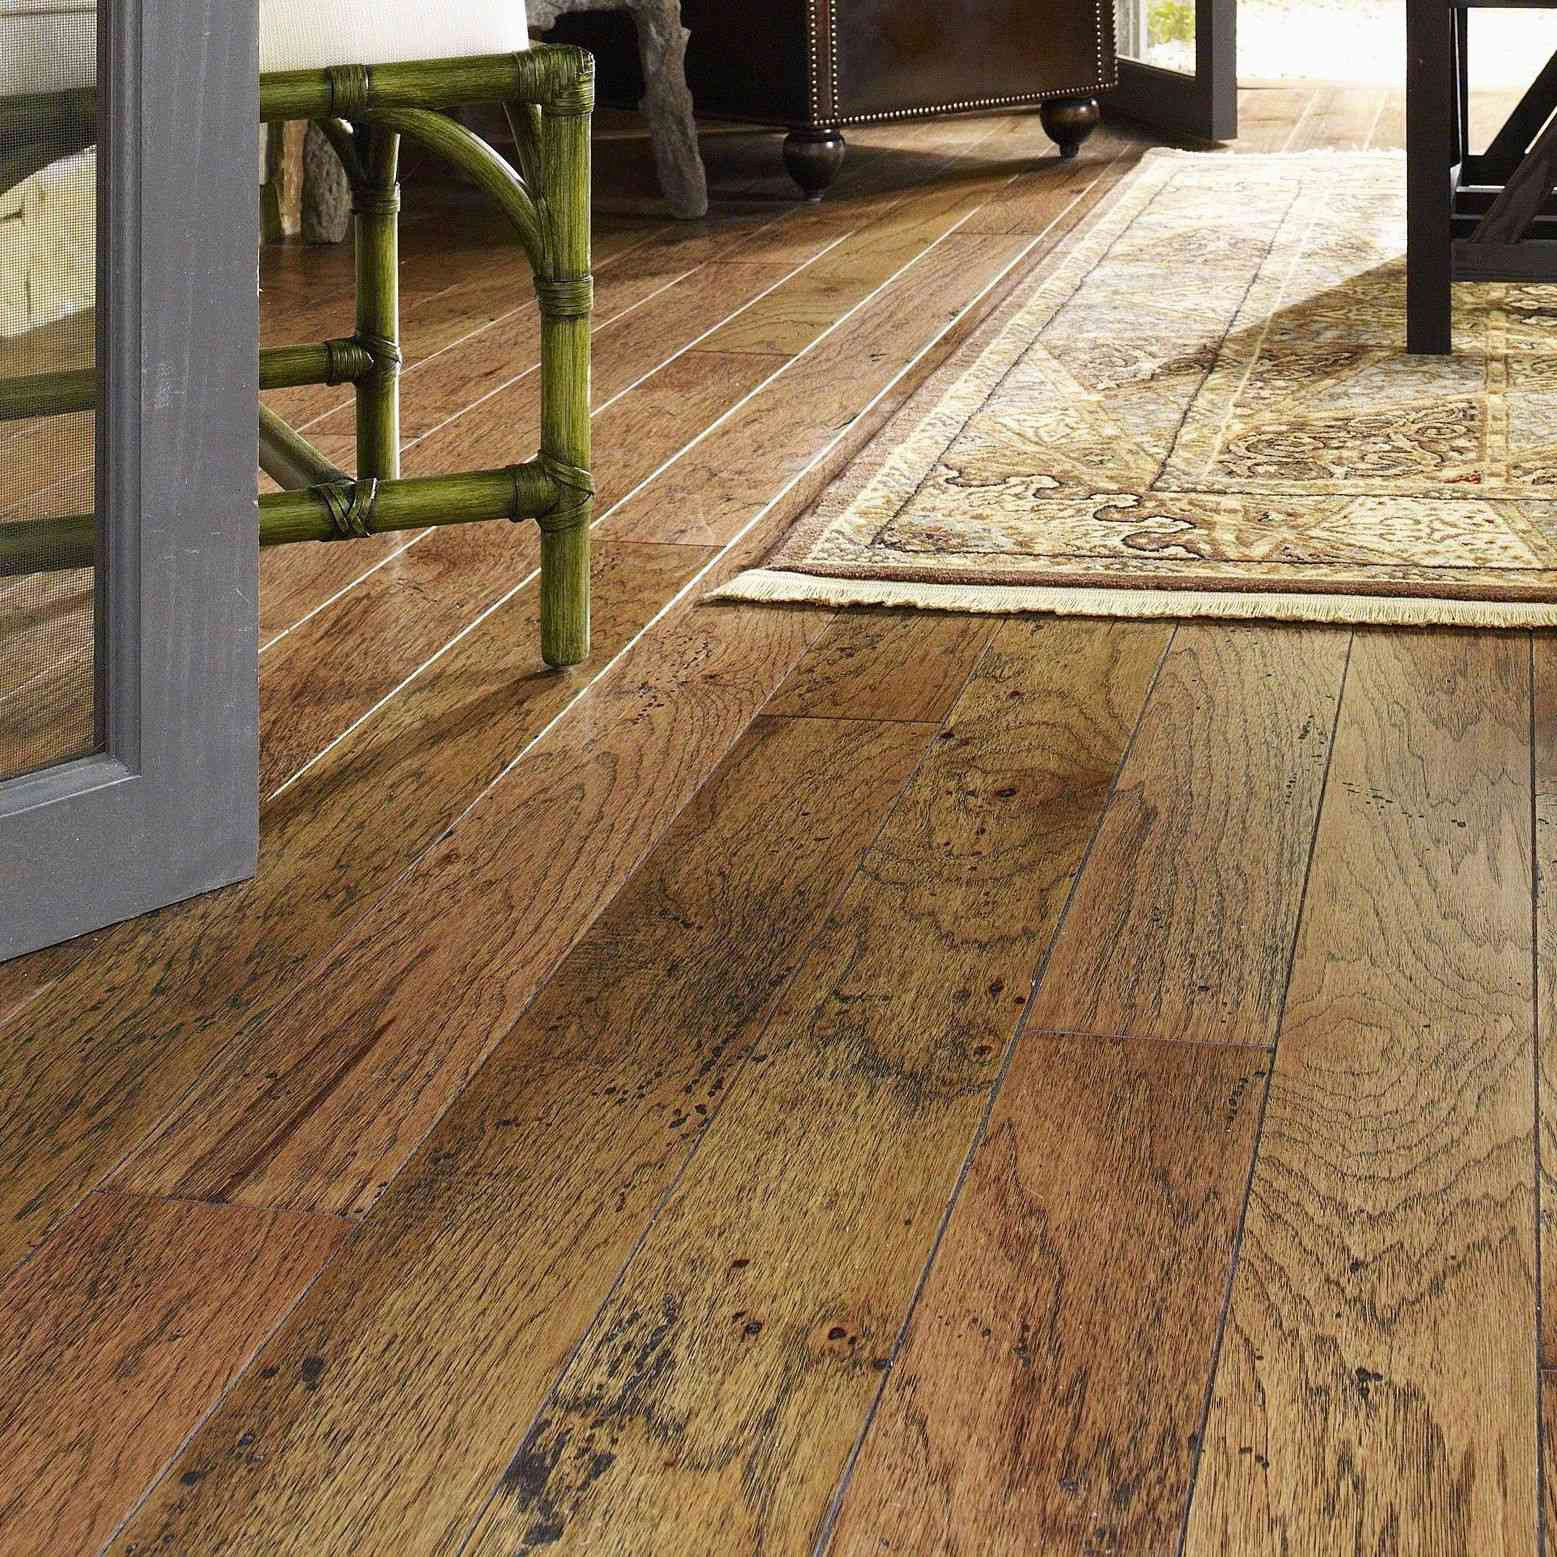 how much does oak hardwood flooring cost of hardwood flooring cost floor plan ideas with regard to hardwood floor designs new best type wood flooring best floor floor wood floor wood 0d